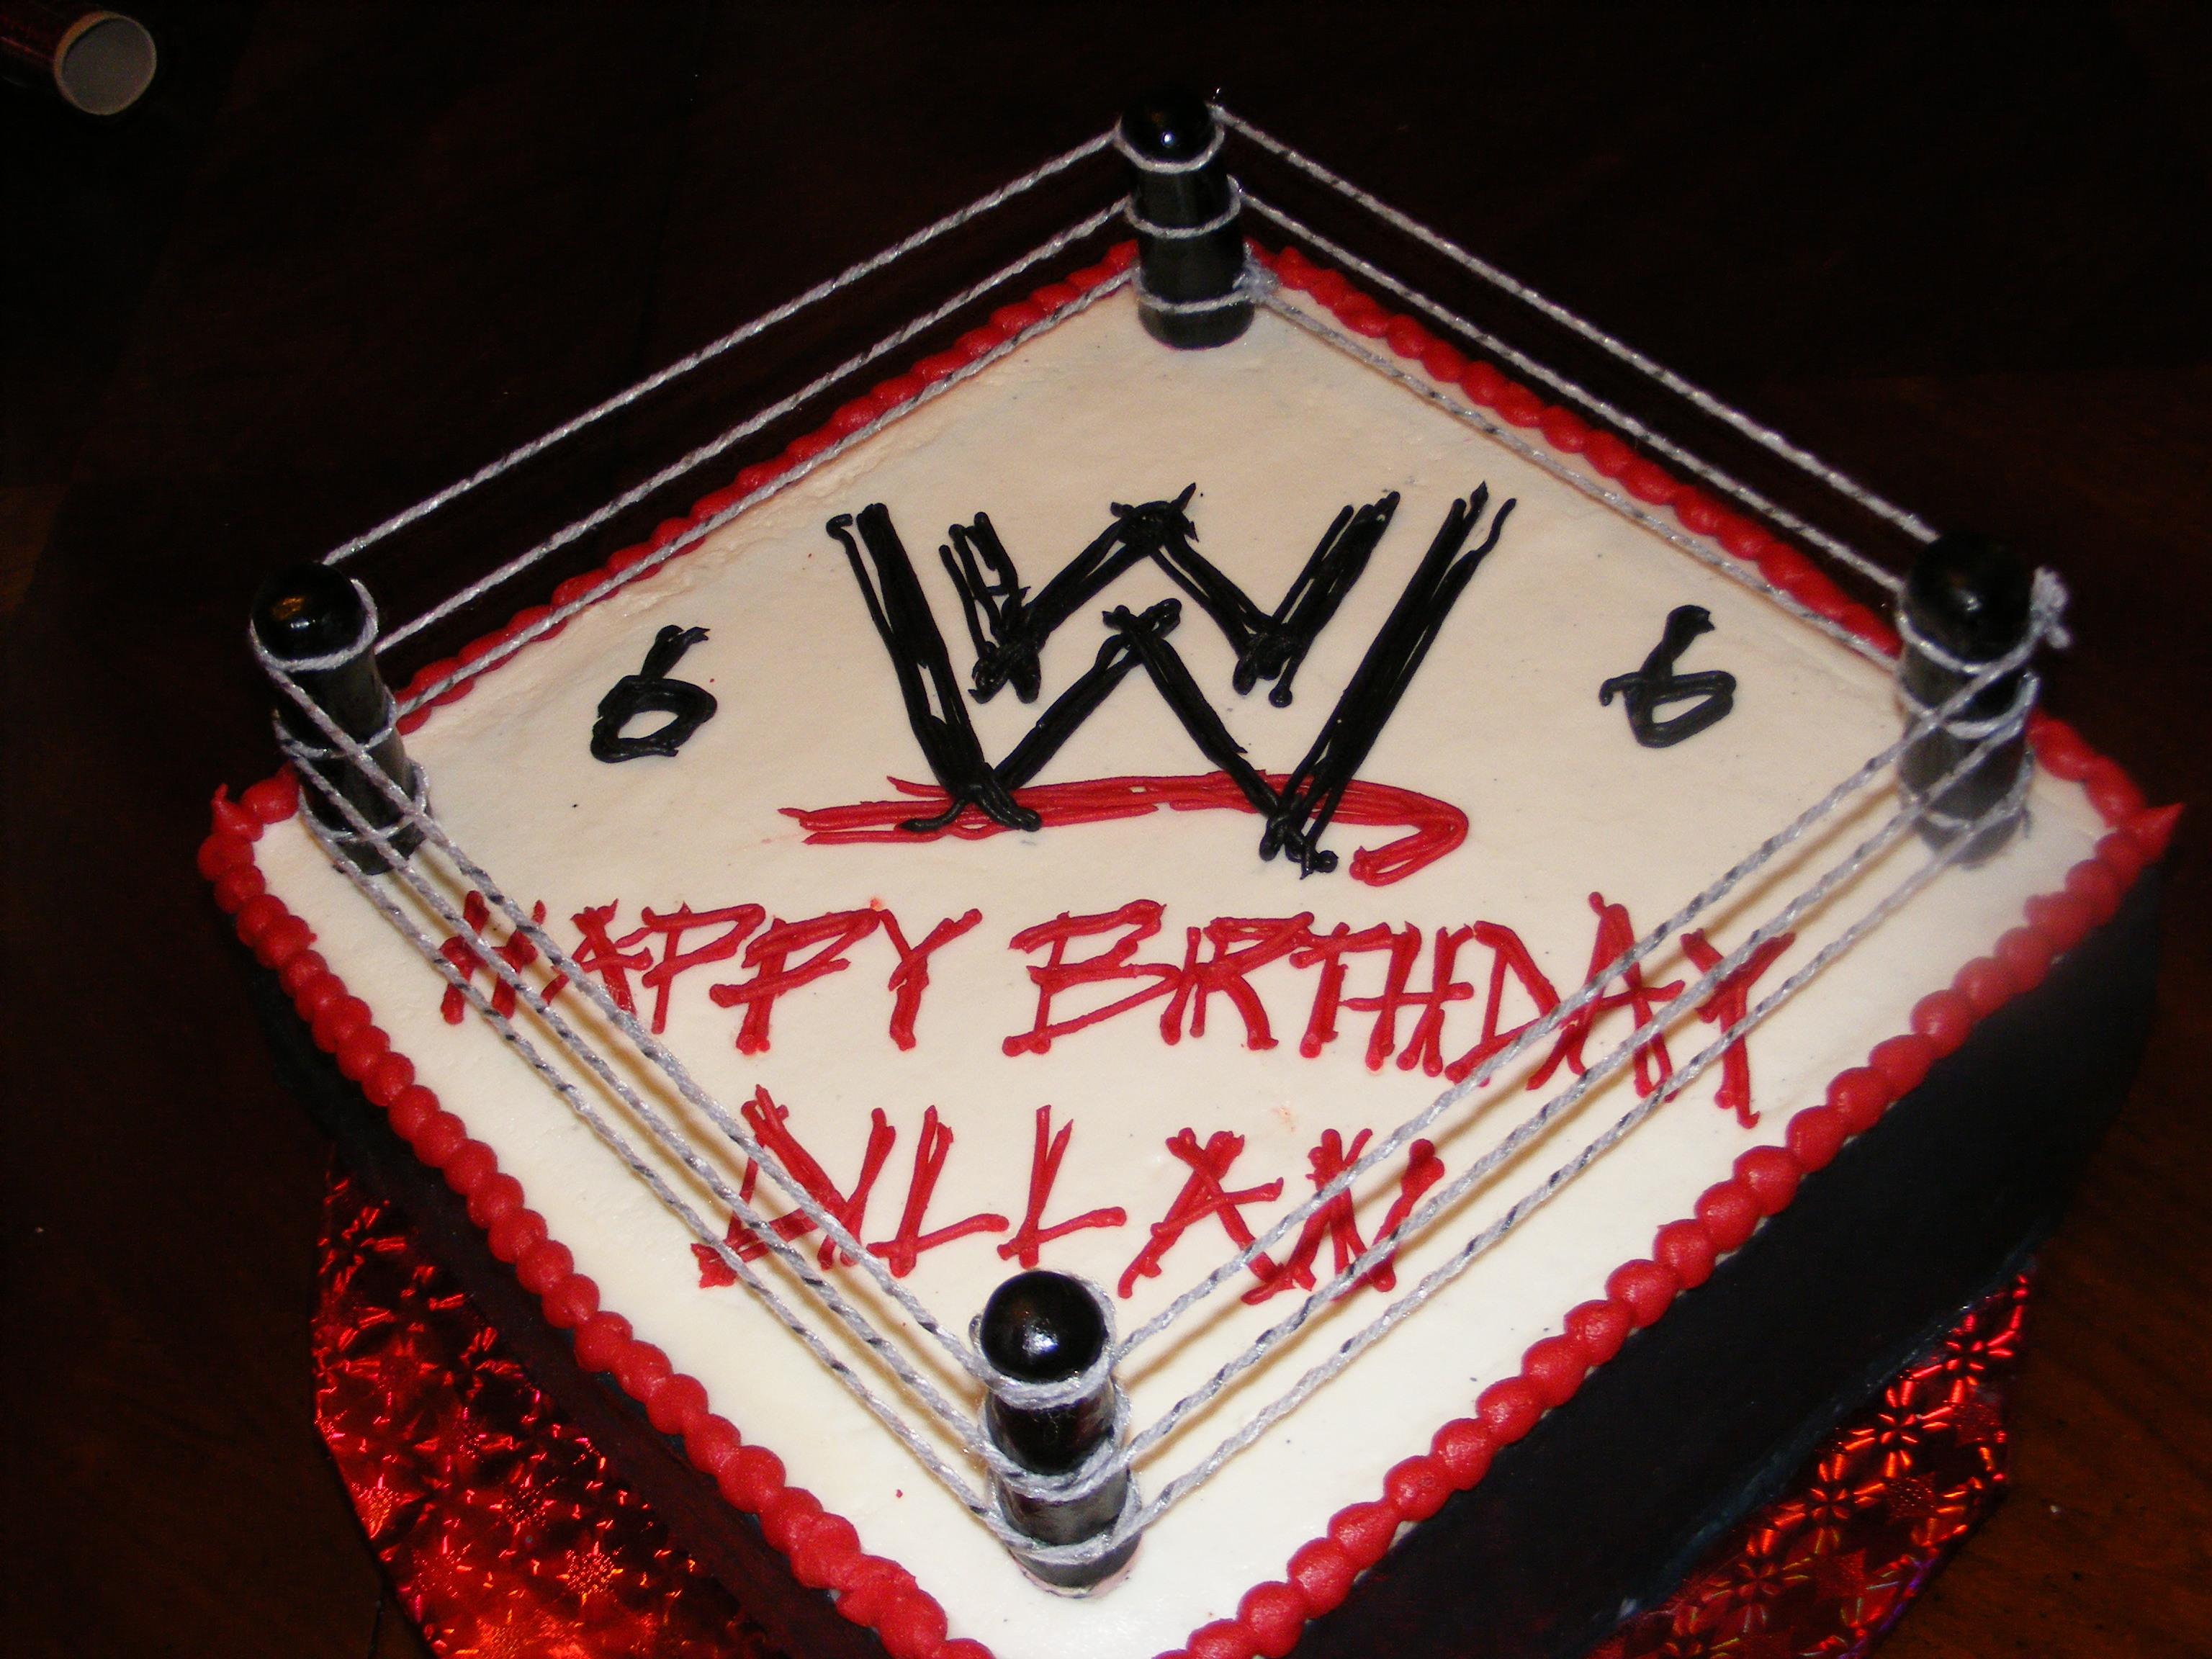 wwe wrestling cakes - Birthday Cake Designs Ideas